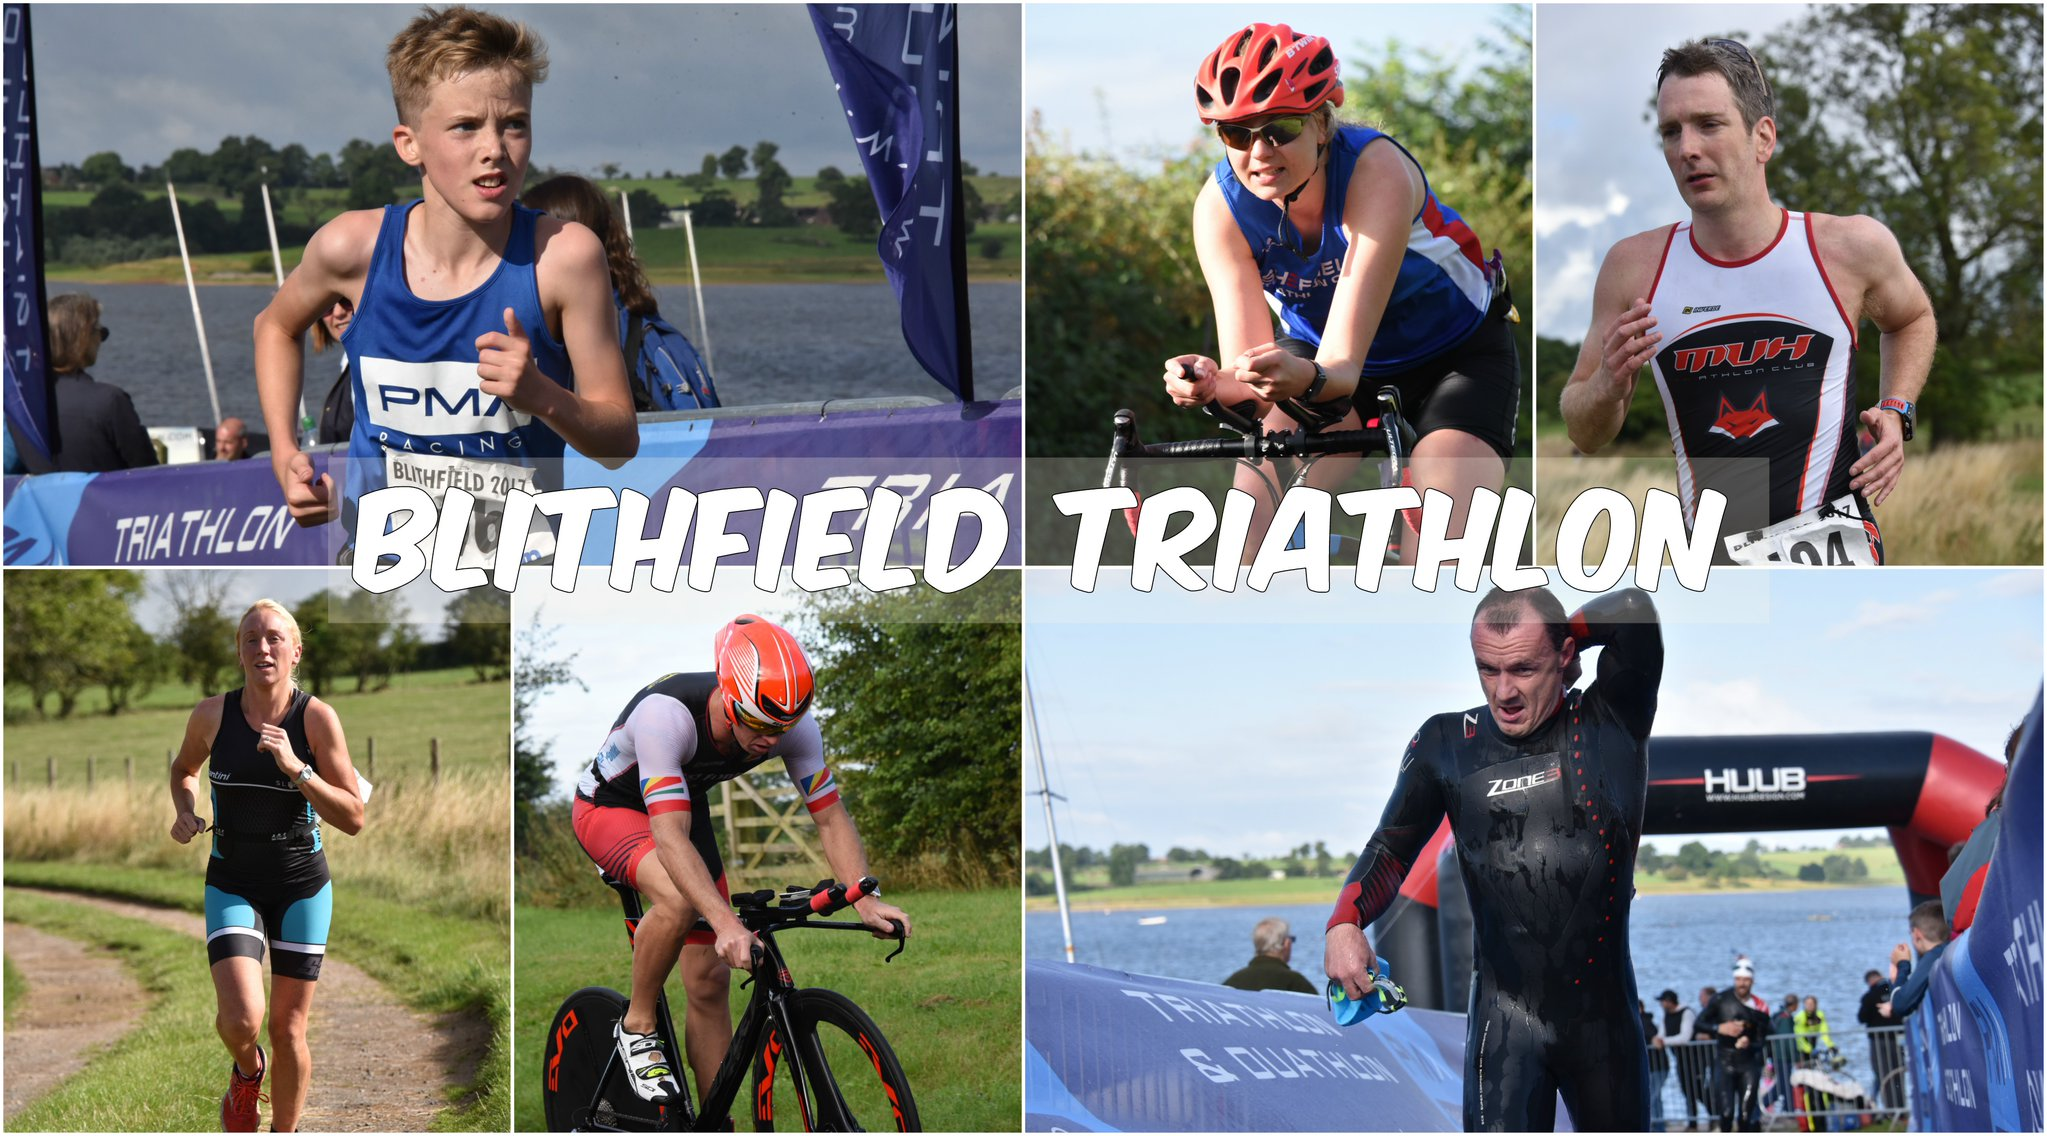 triathlon 9th september 2017